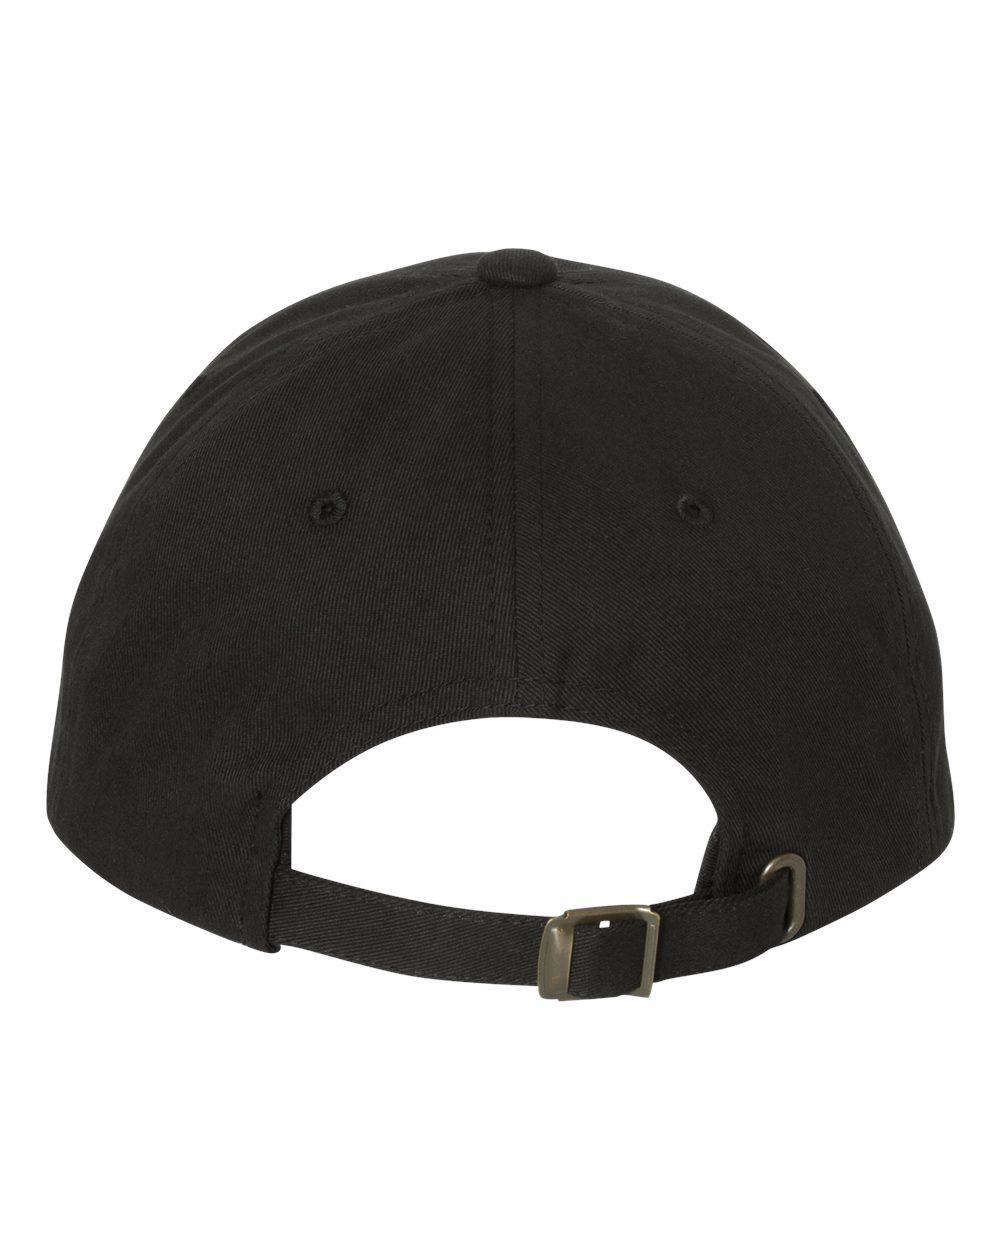 Big Daddy Signature Dad Hat Black